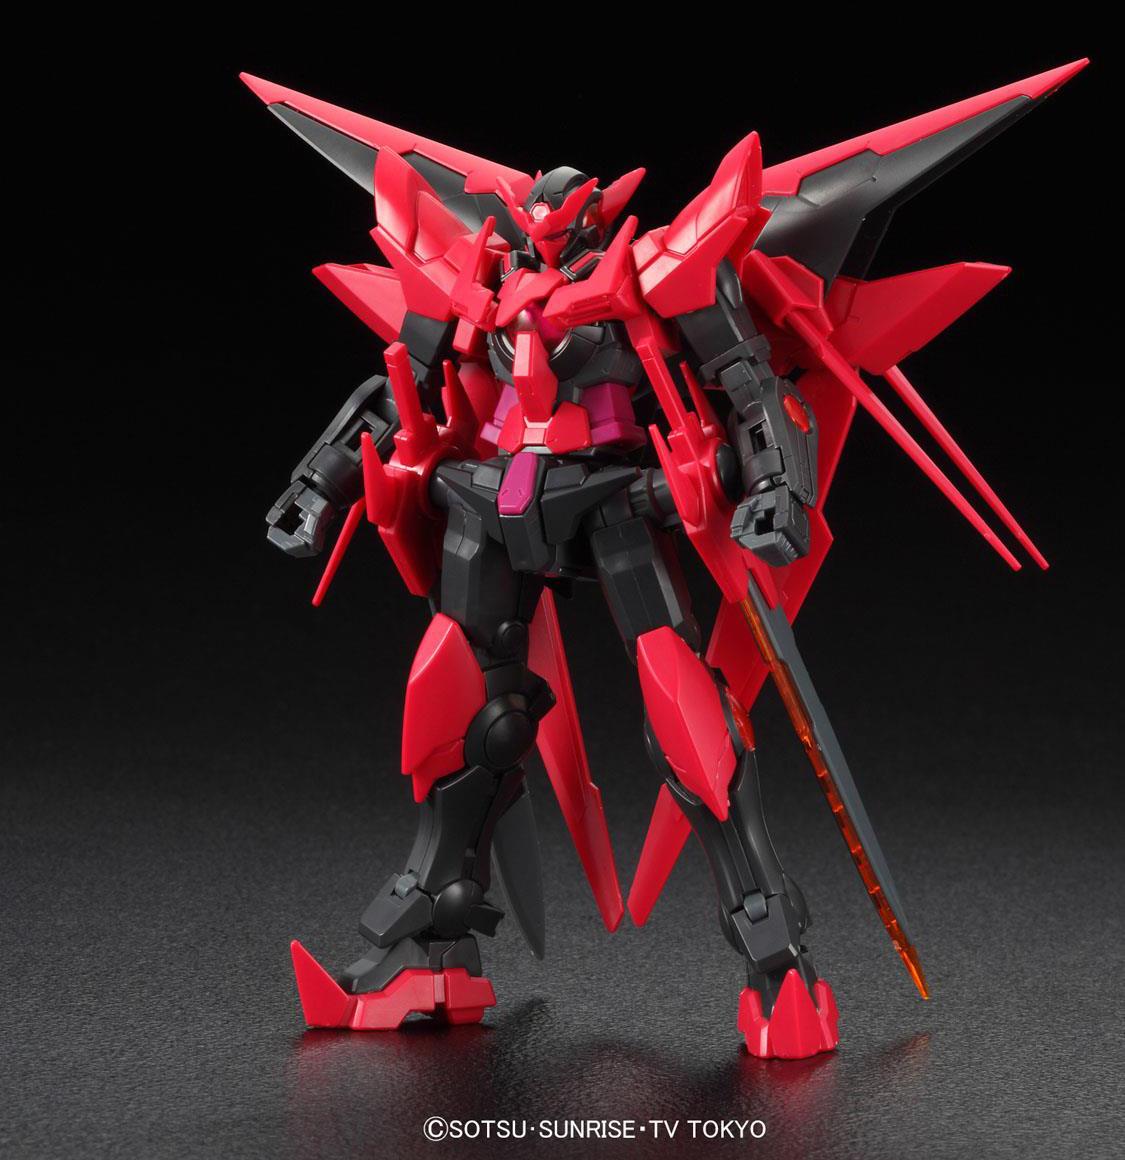 HGBF 1144 Gundam Exia Dark Matter UPDATE Big or Wallpaper Size 1125x1160